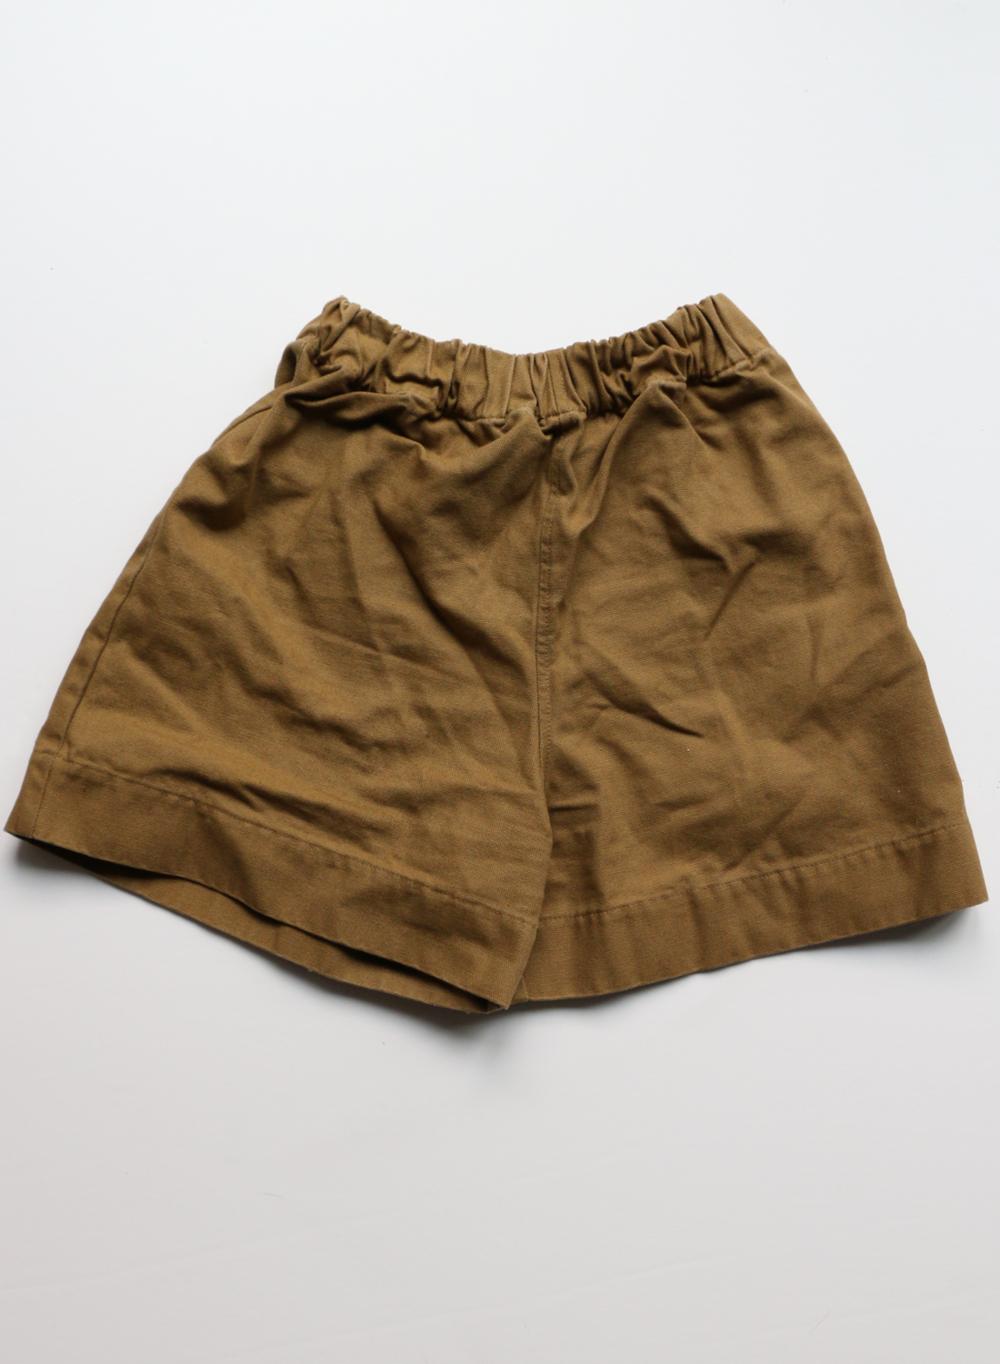 elizabeth-suzann-florence-shorts.png